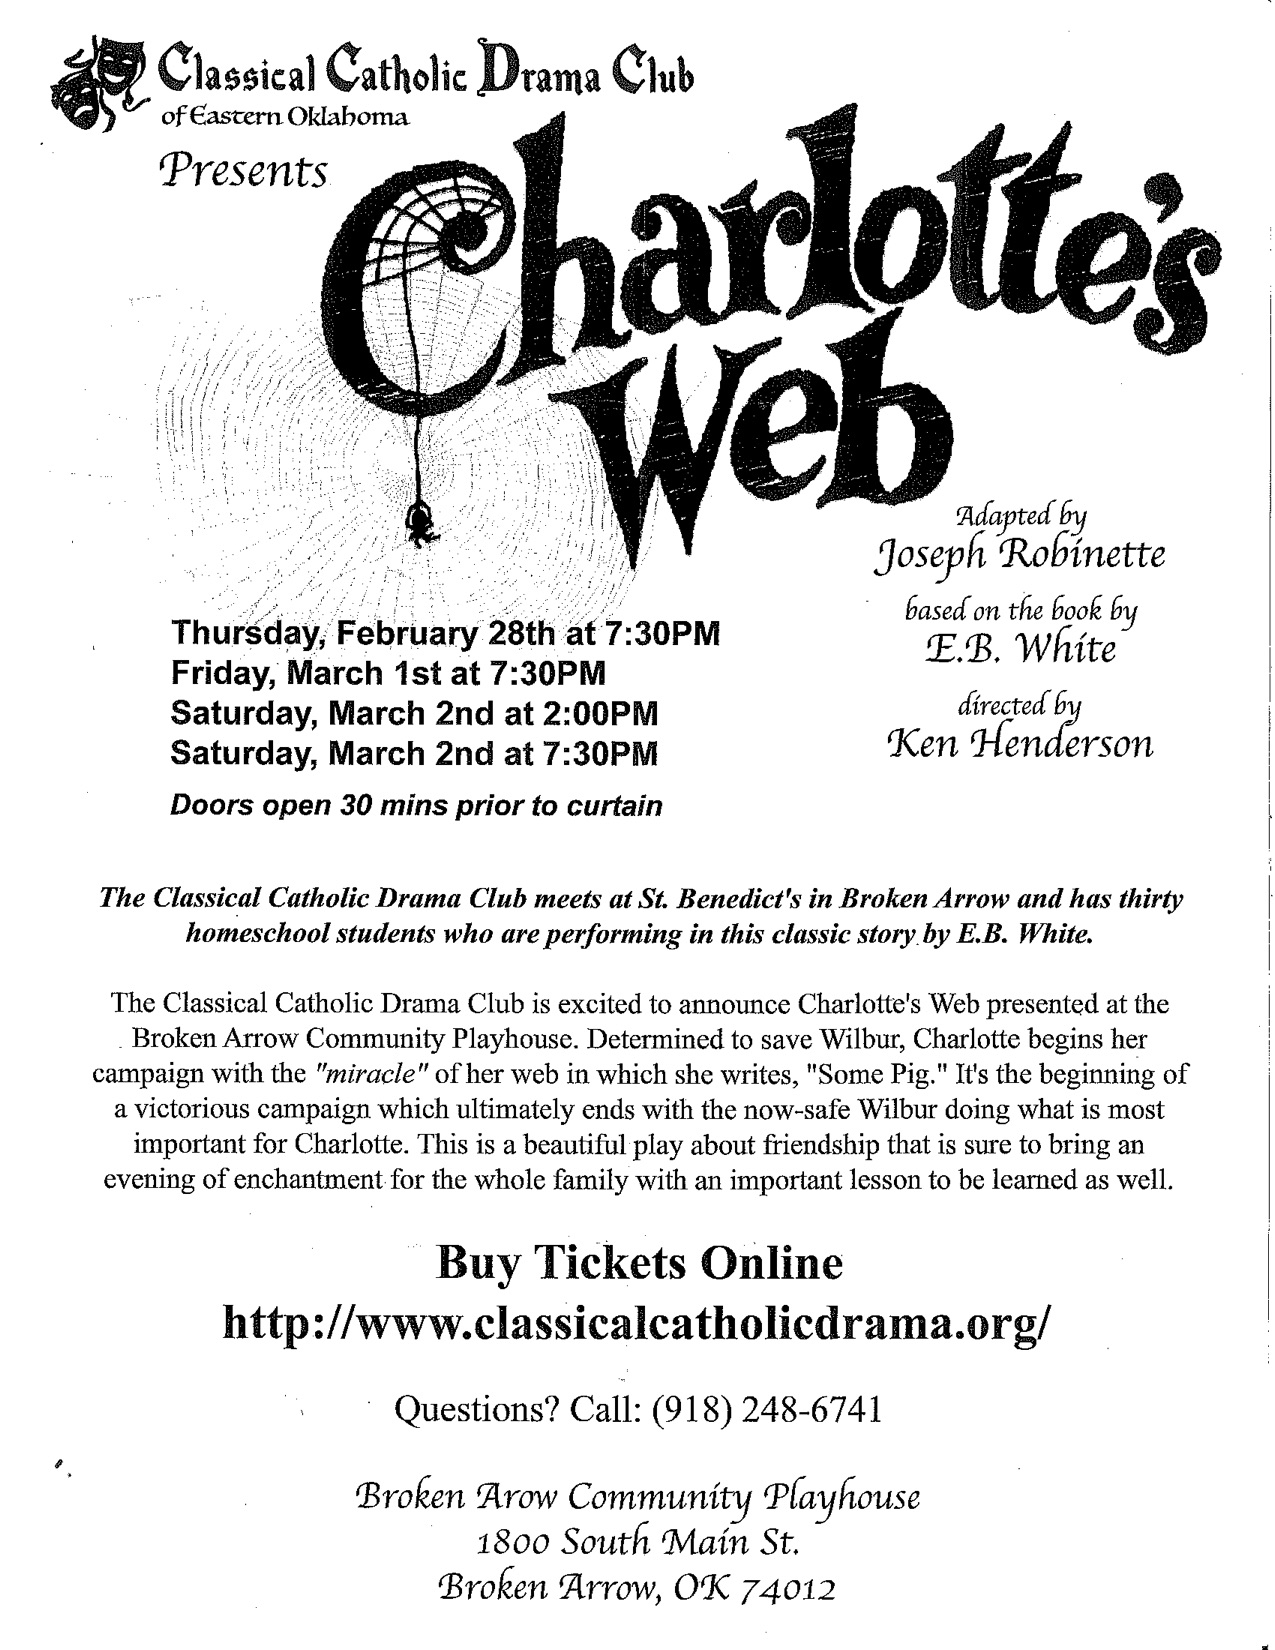 charlotteswebflyer.jpg